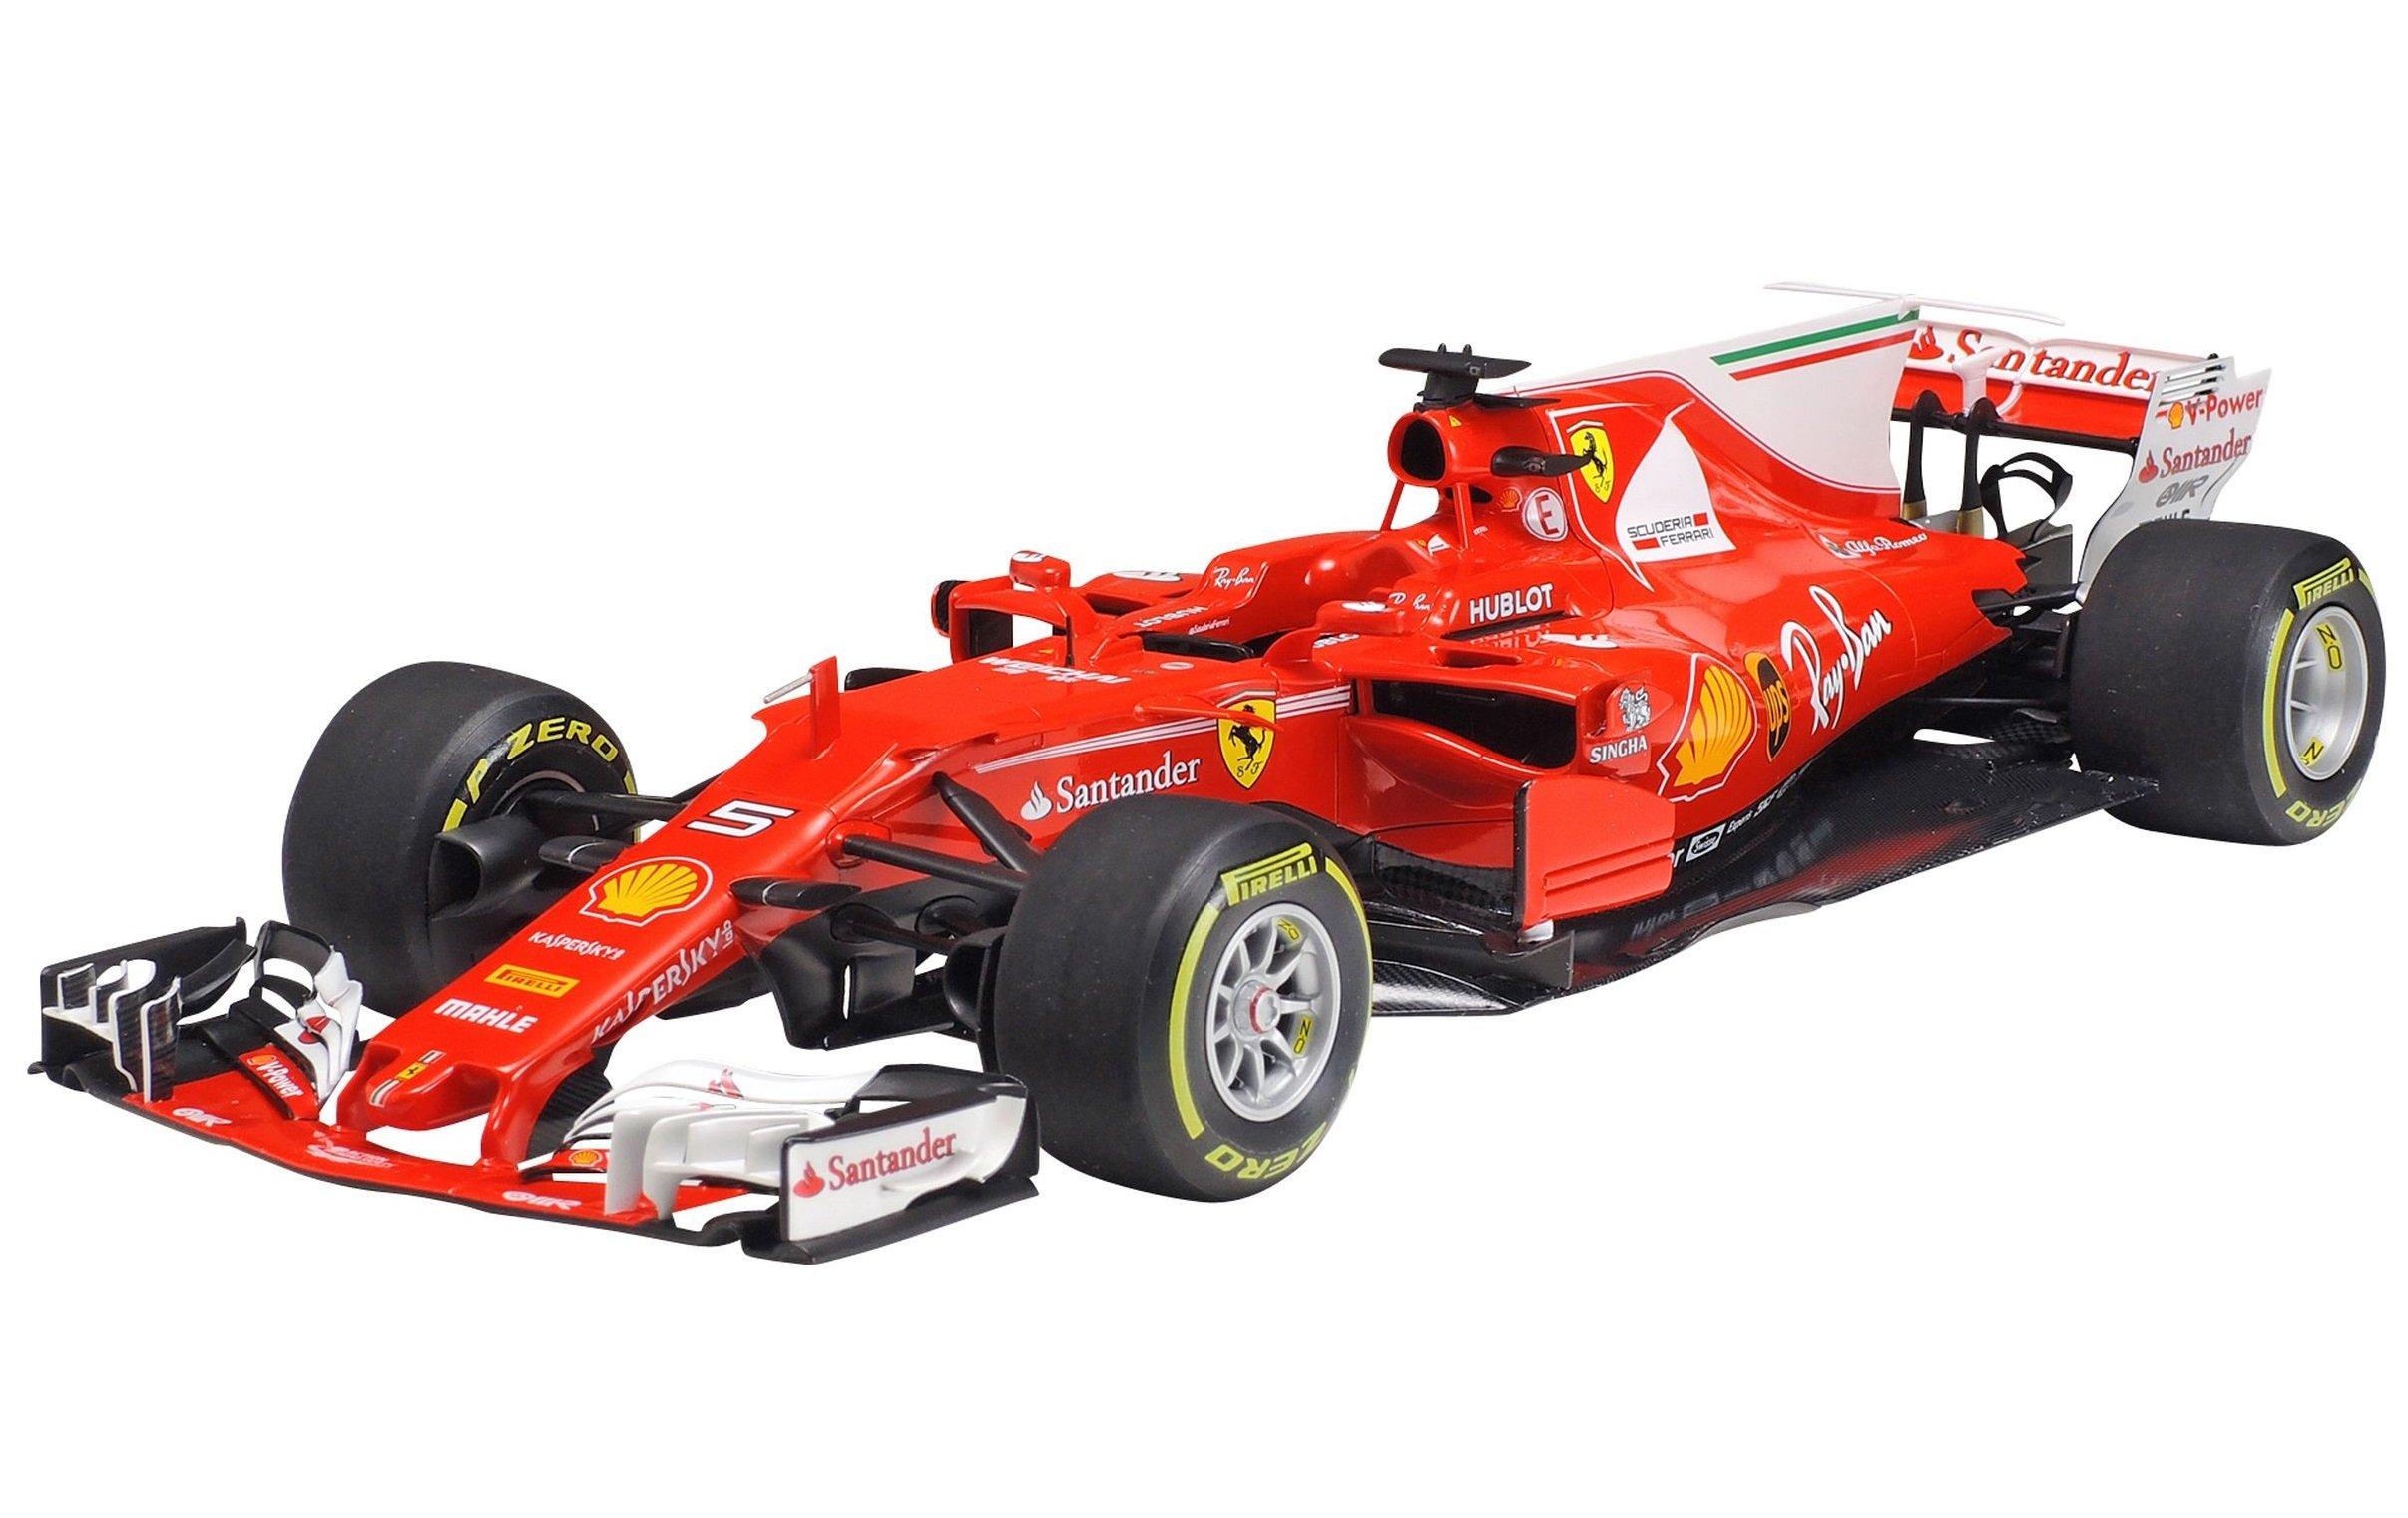 Tamiya 20068 1/20 Ferrari SF70H Plastic Model Kit